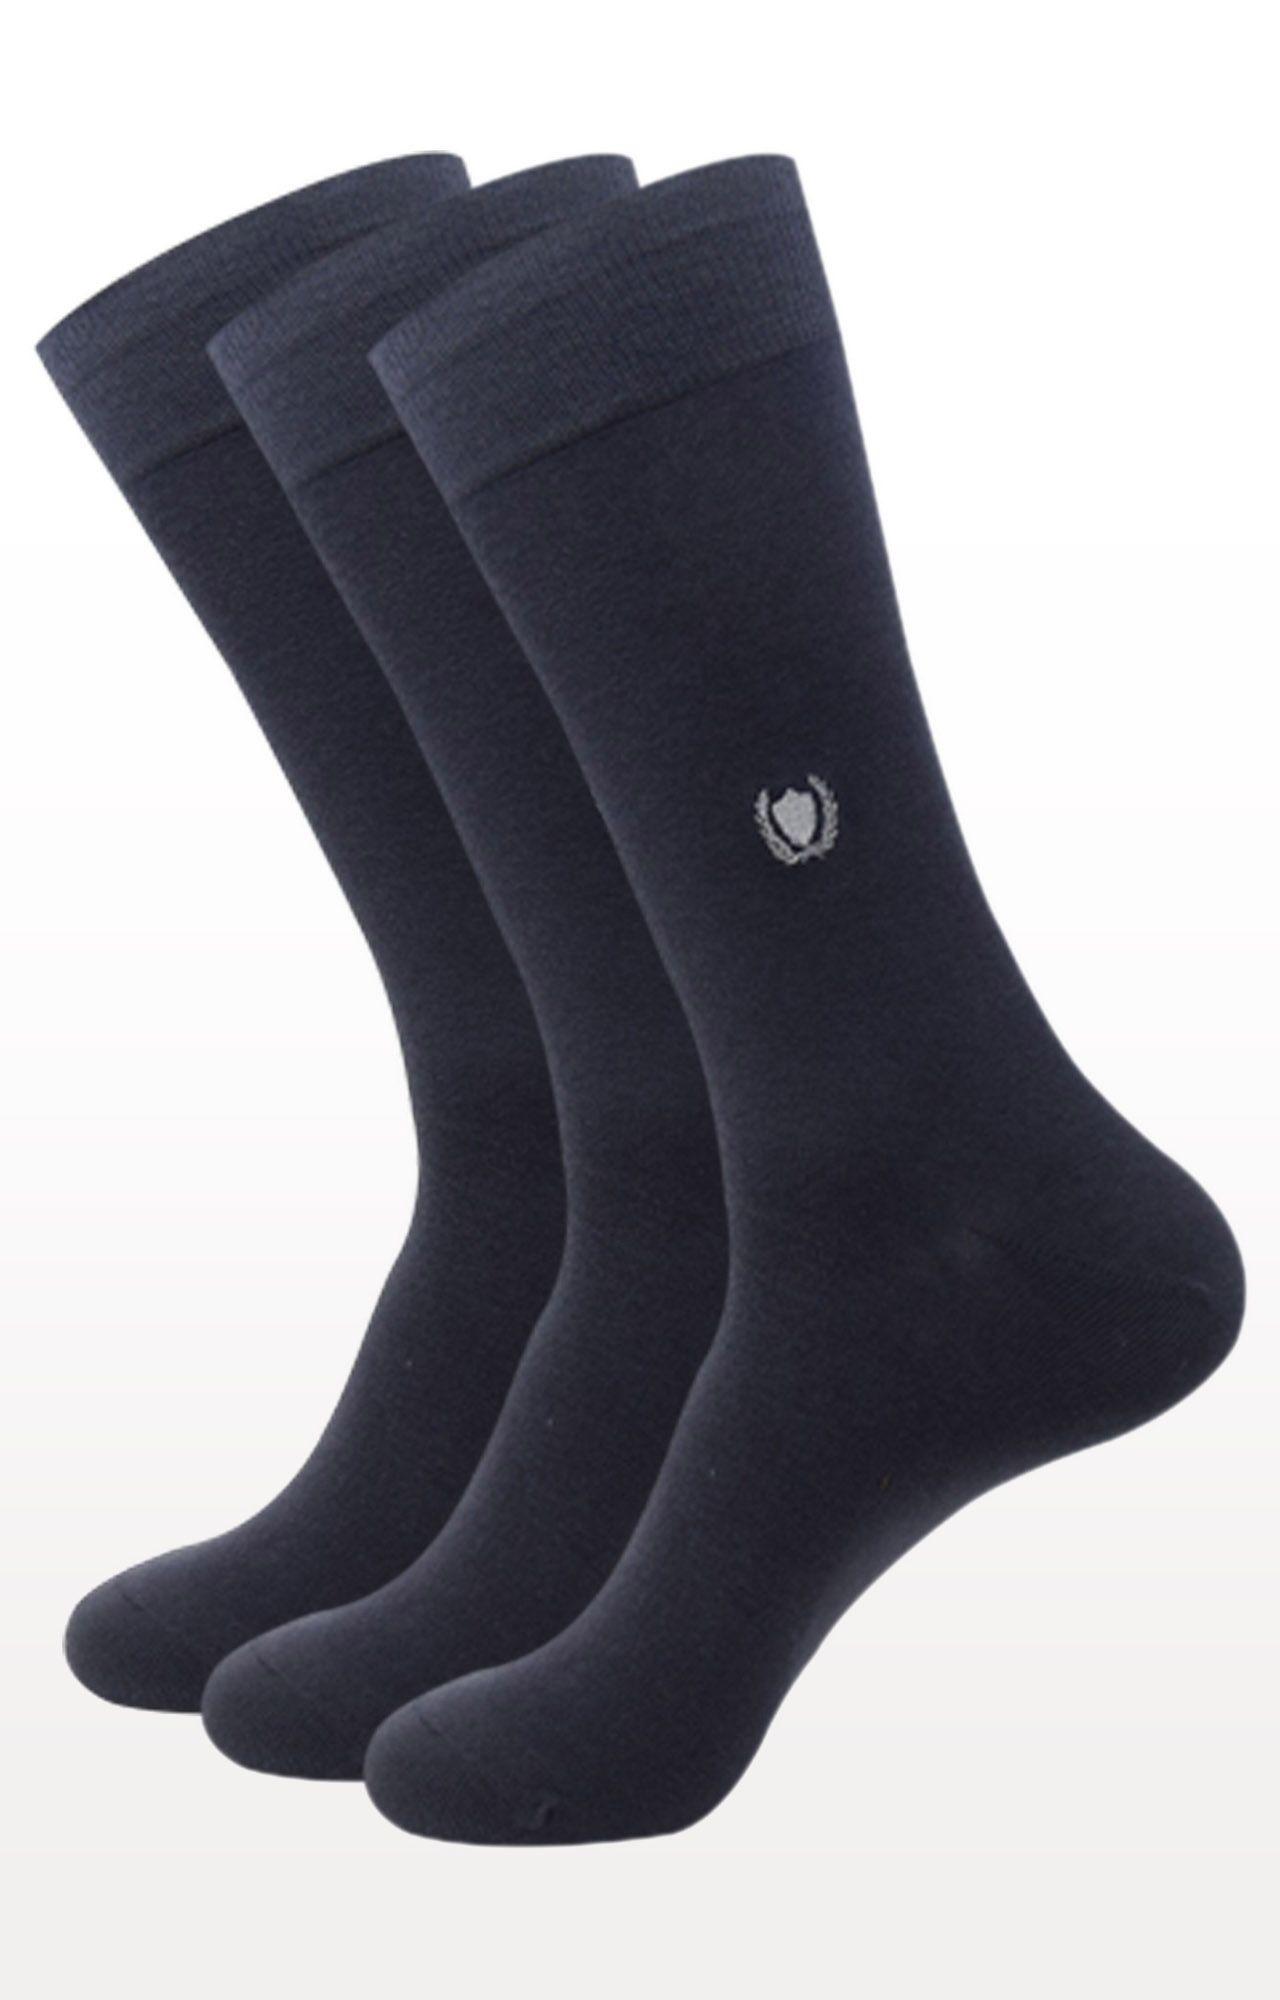 BALENZIA | Dark Grey Solid Socks - Pack of 3